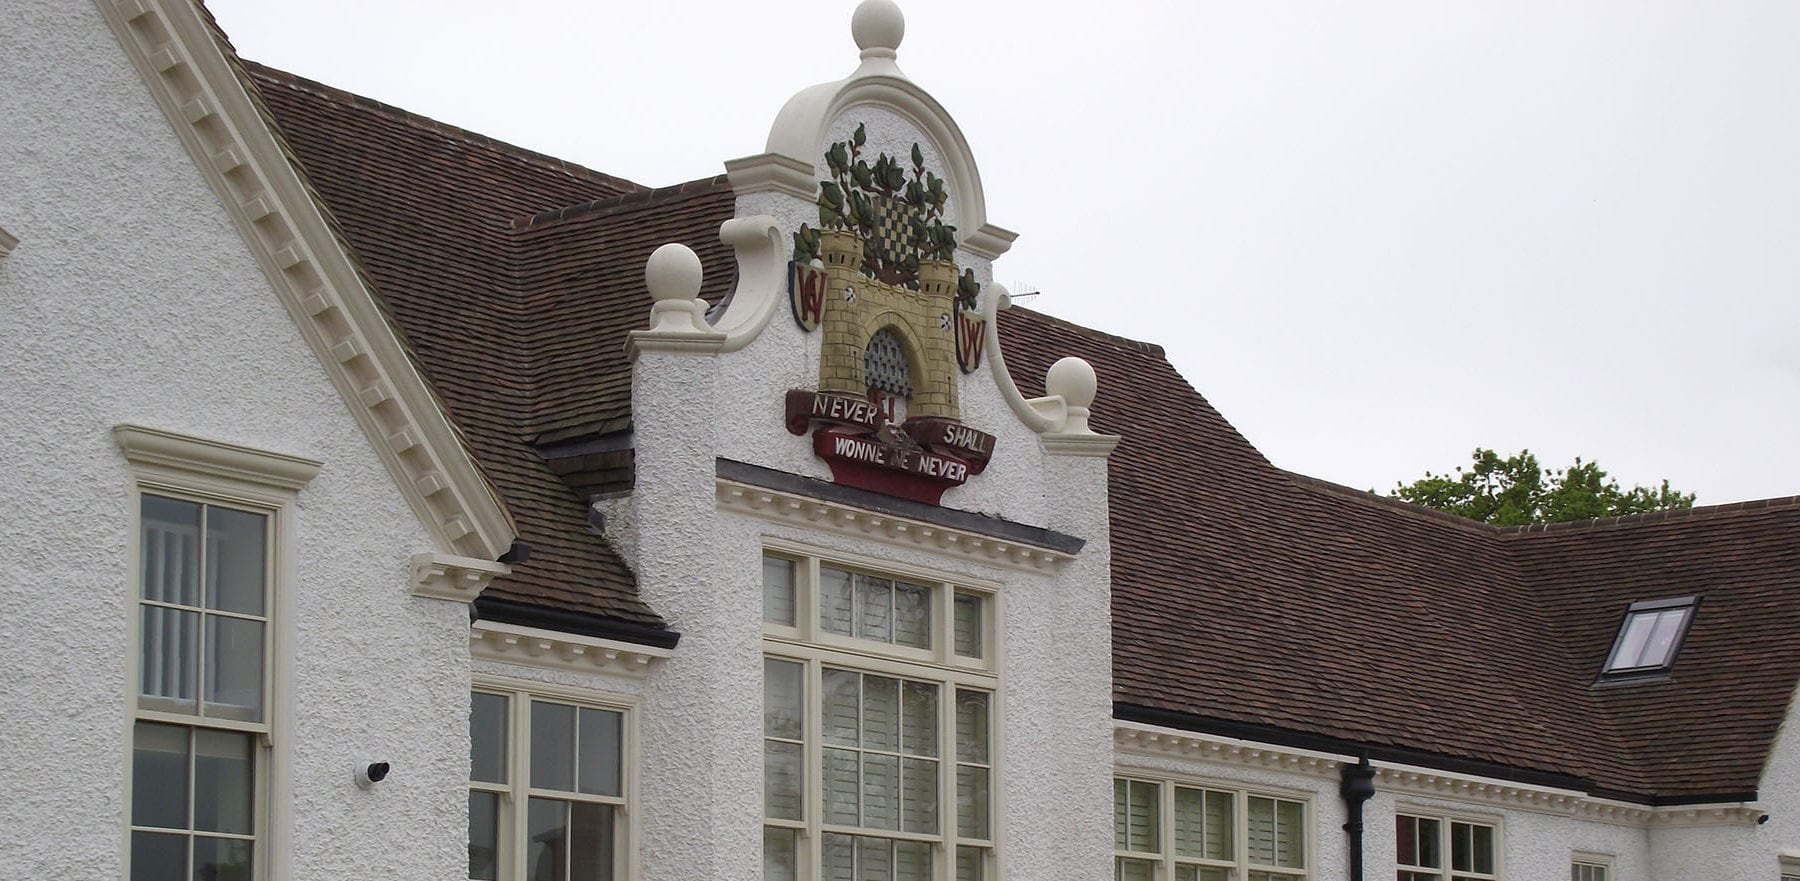 Lifestiles - Handmade Restoration Clay Roof Tiles - Redhill, England 5